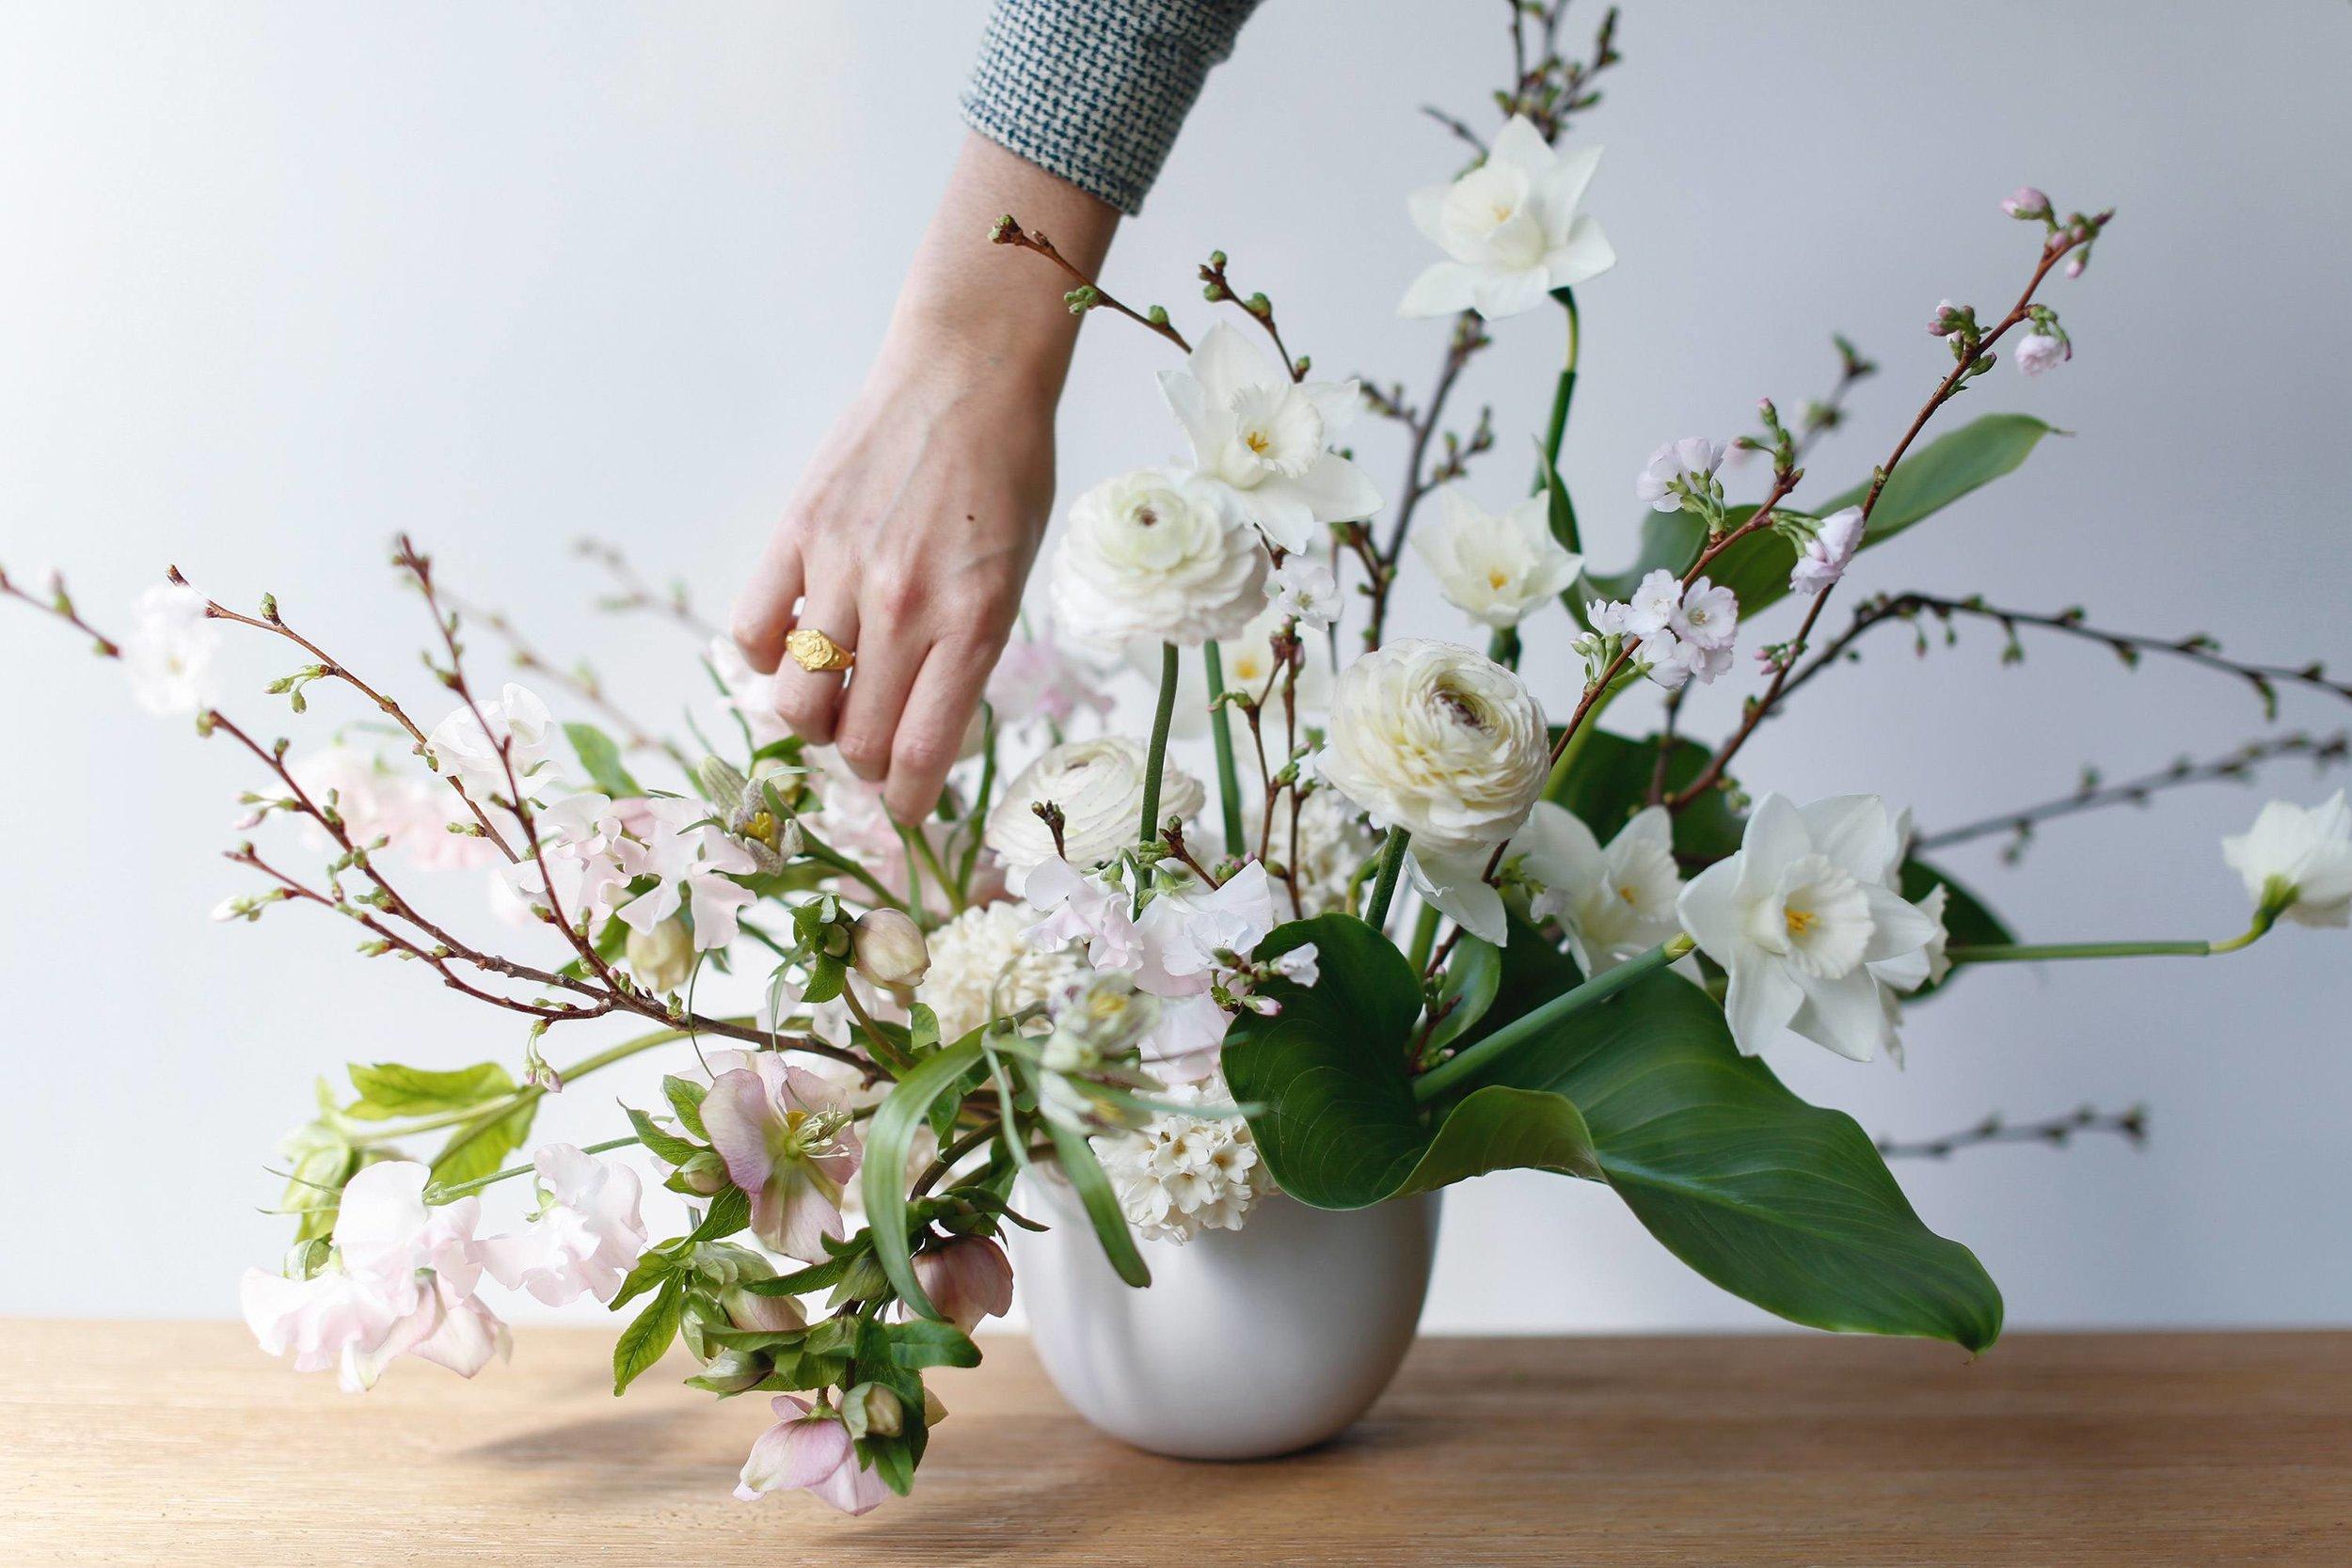 floral-design-101-lambert-floral-studio-spring-arrangement-12.jpg